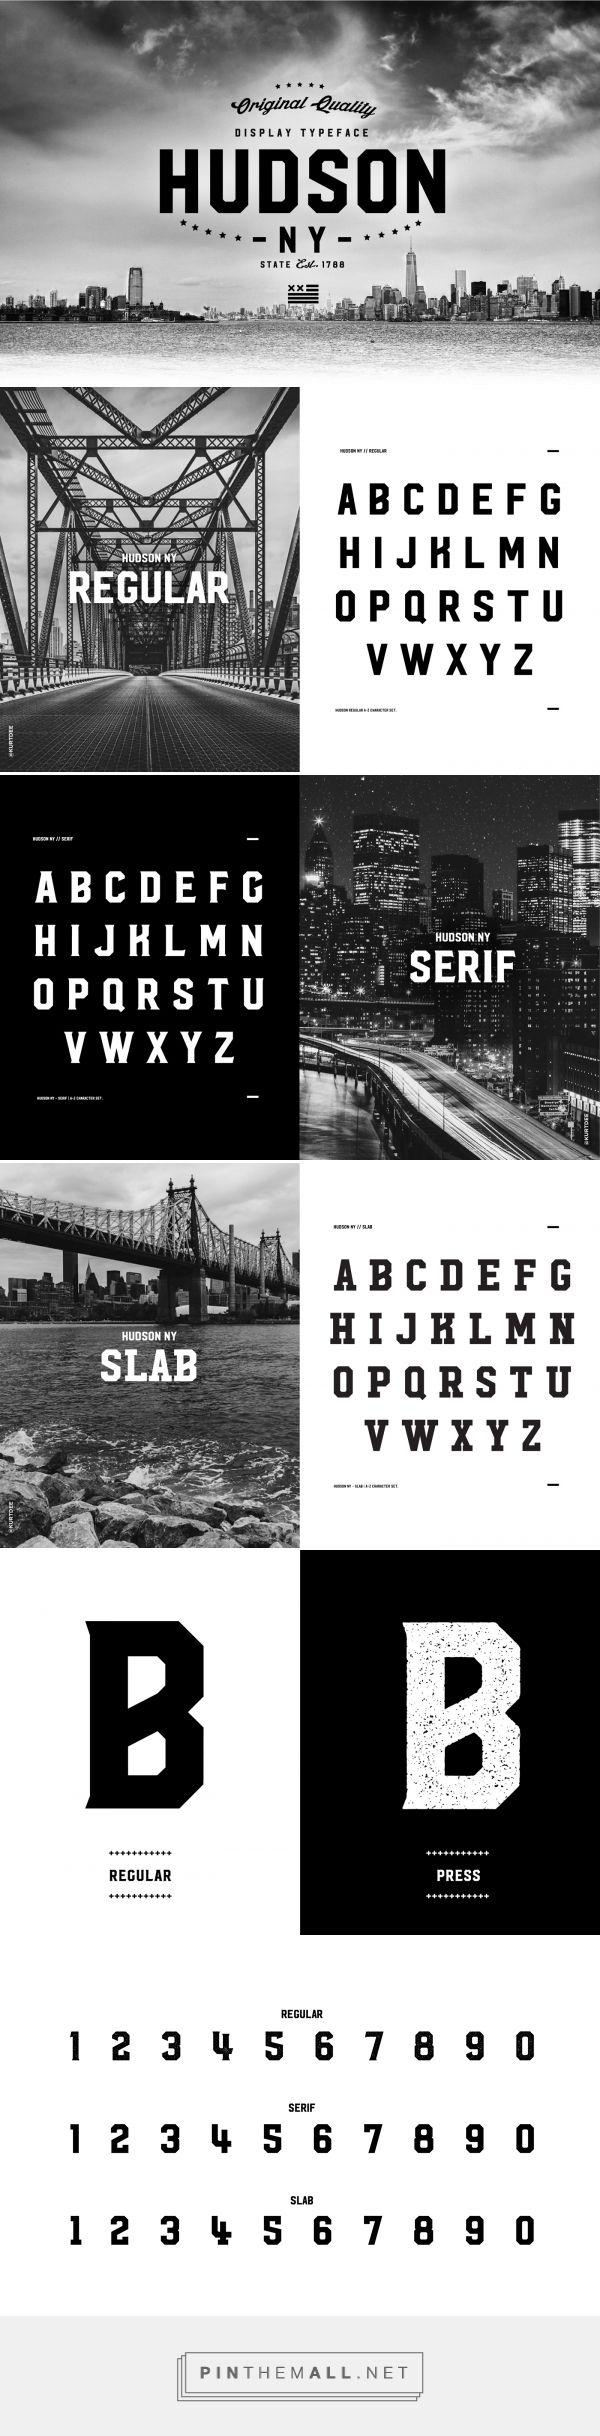 Hudson NY | Display Font on Behance - created via https://pinthemall.net